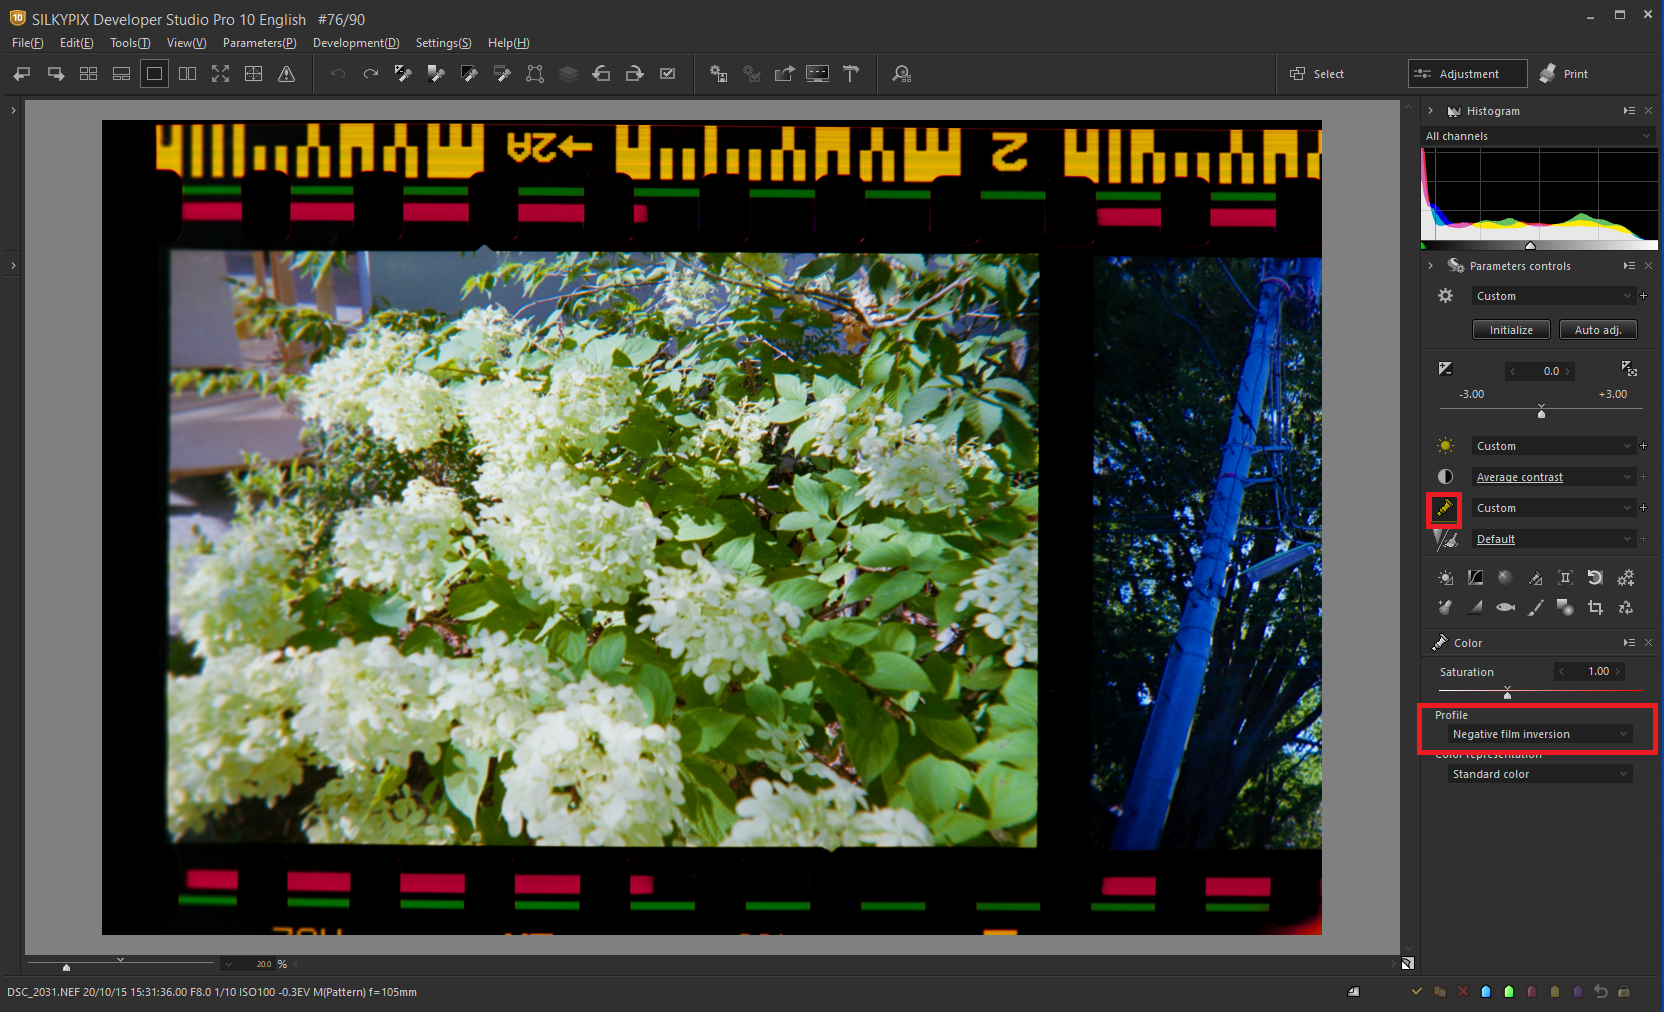 the Negative film inversion tool 1-3